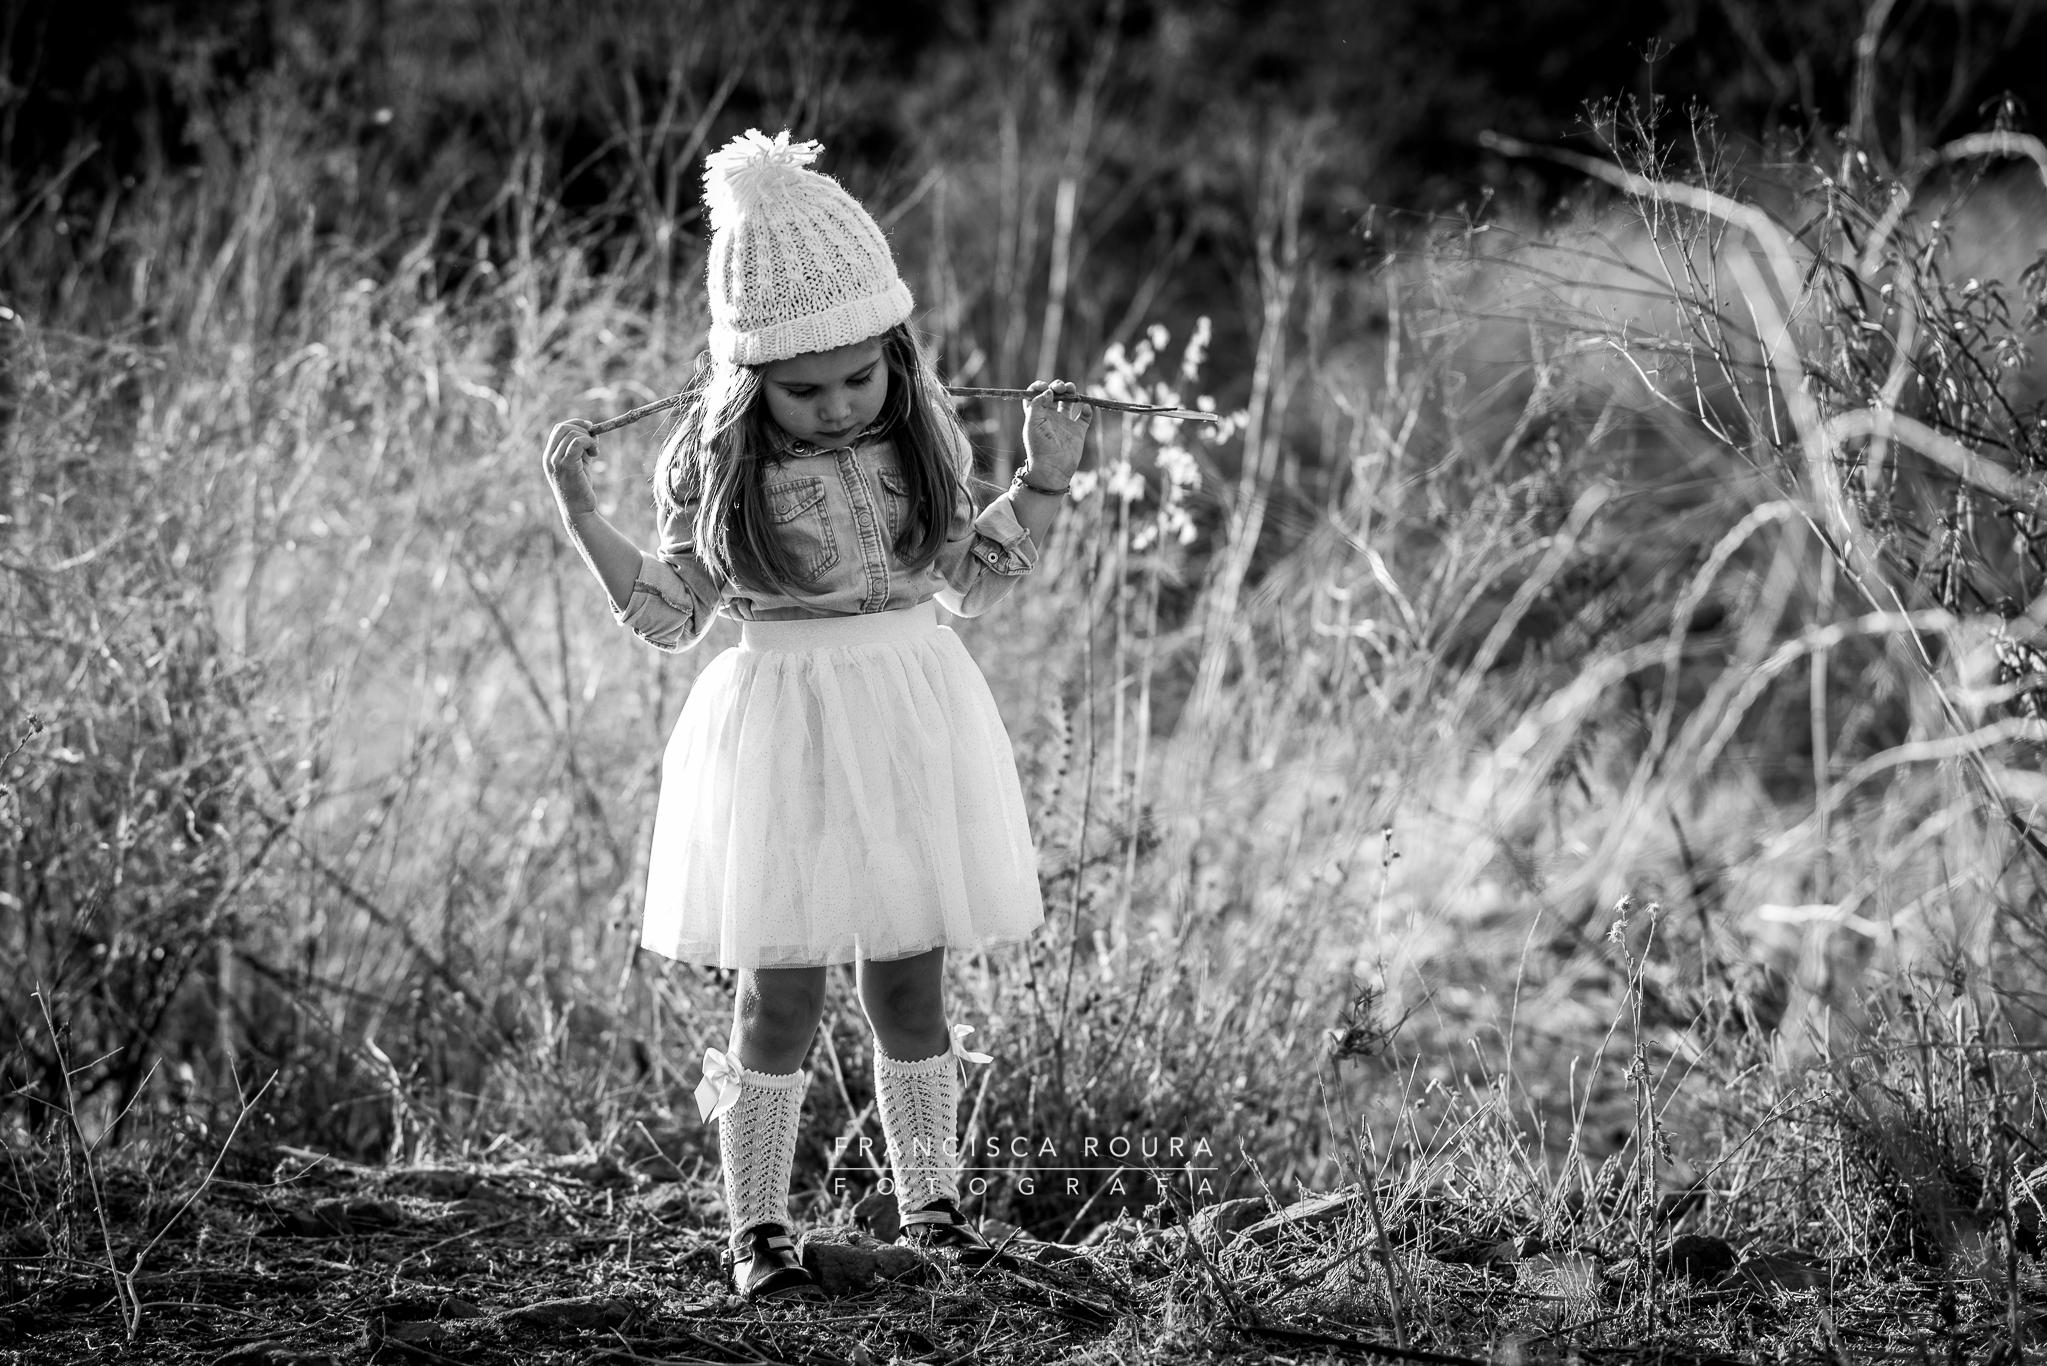 Javimartino_FotosFranciscaRoura--18